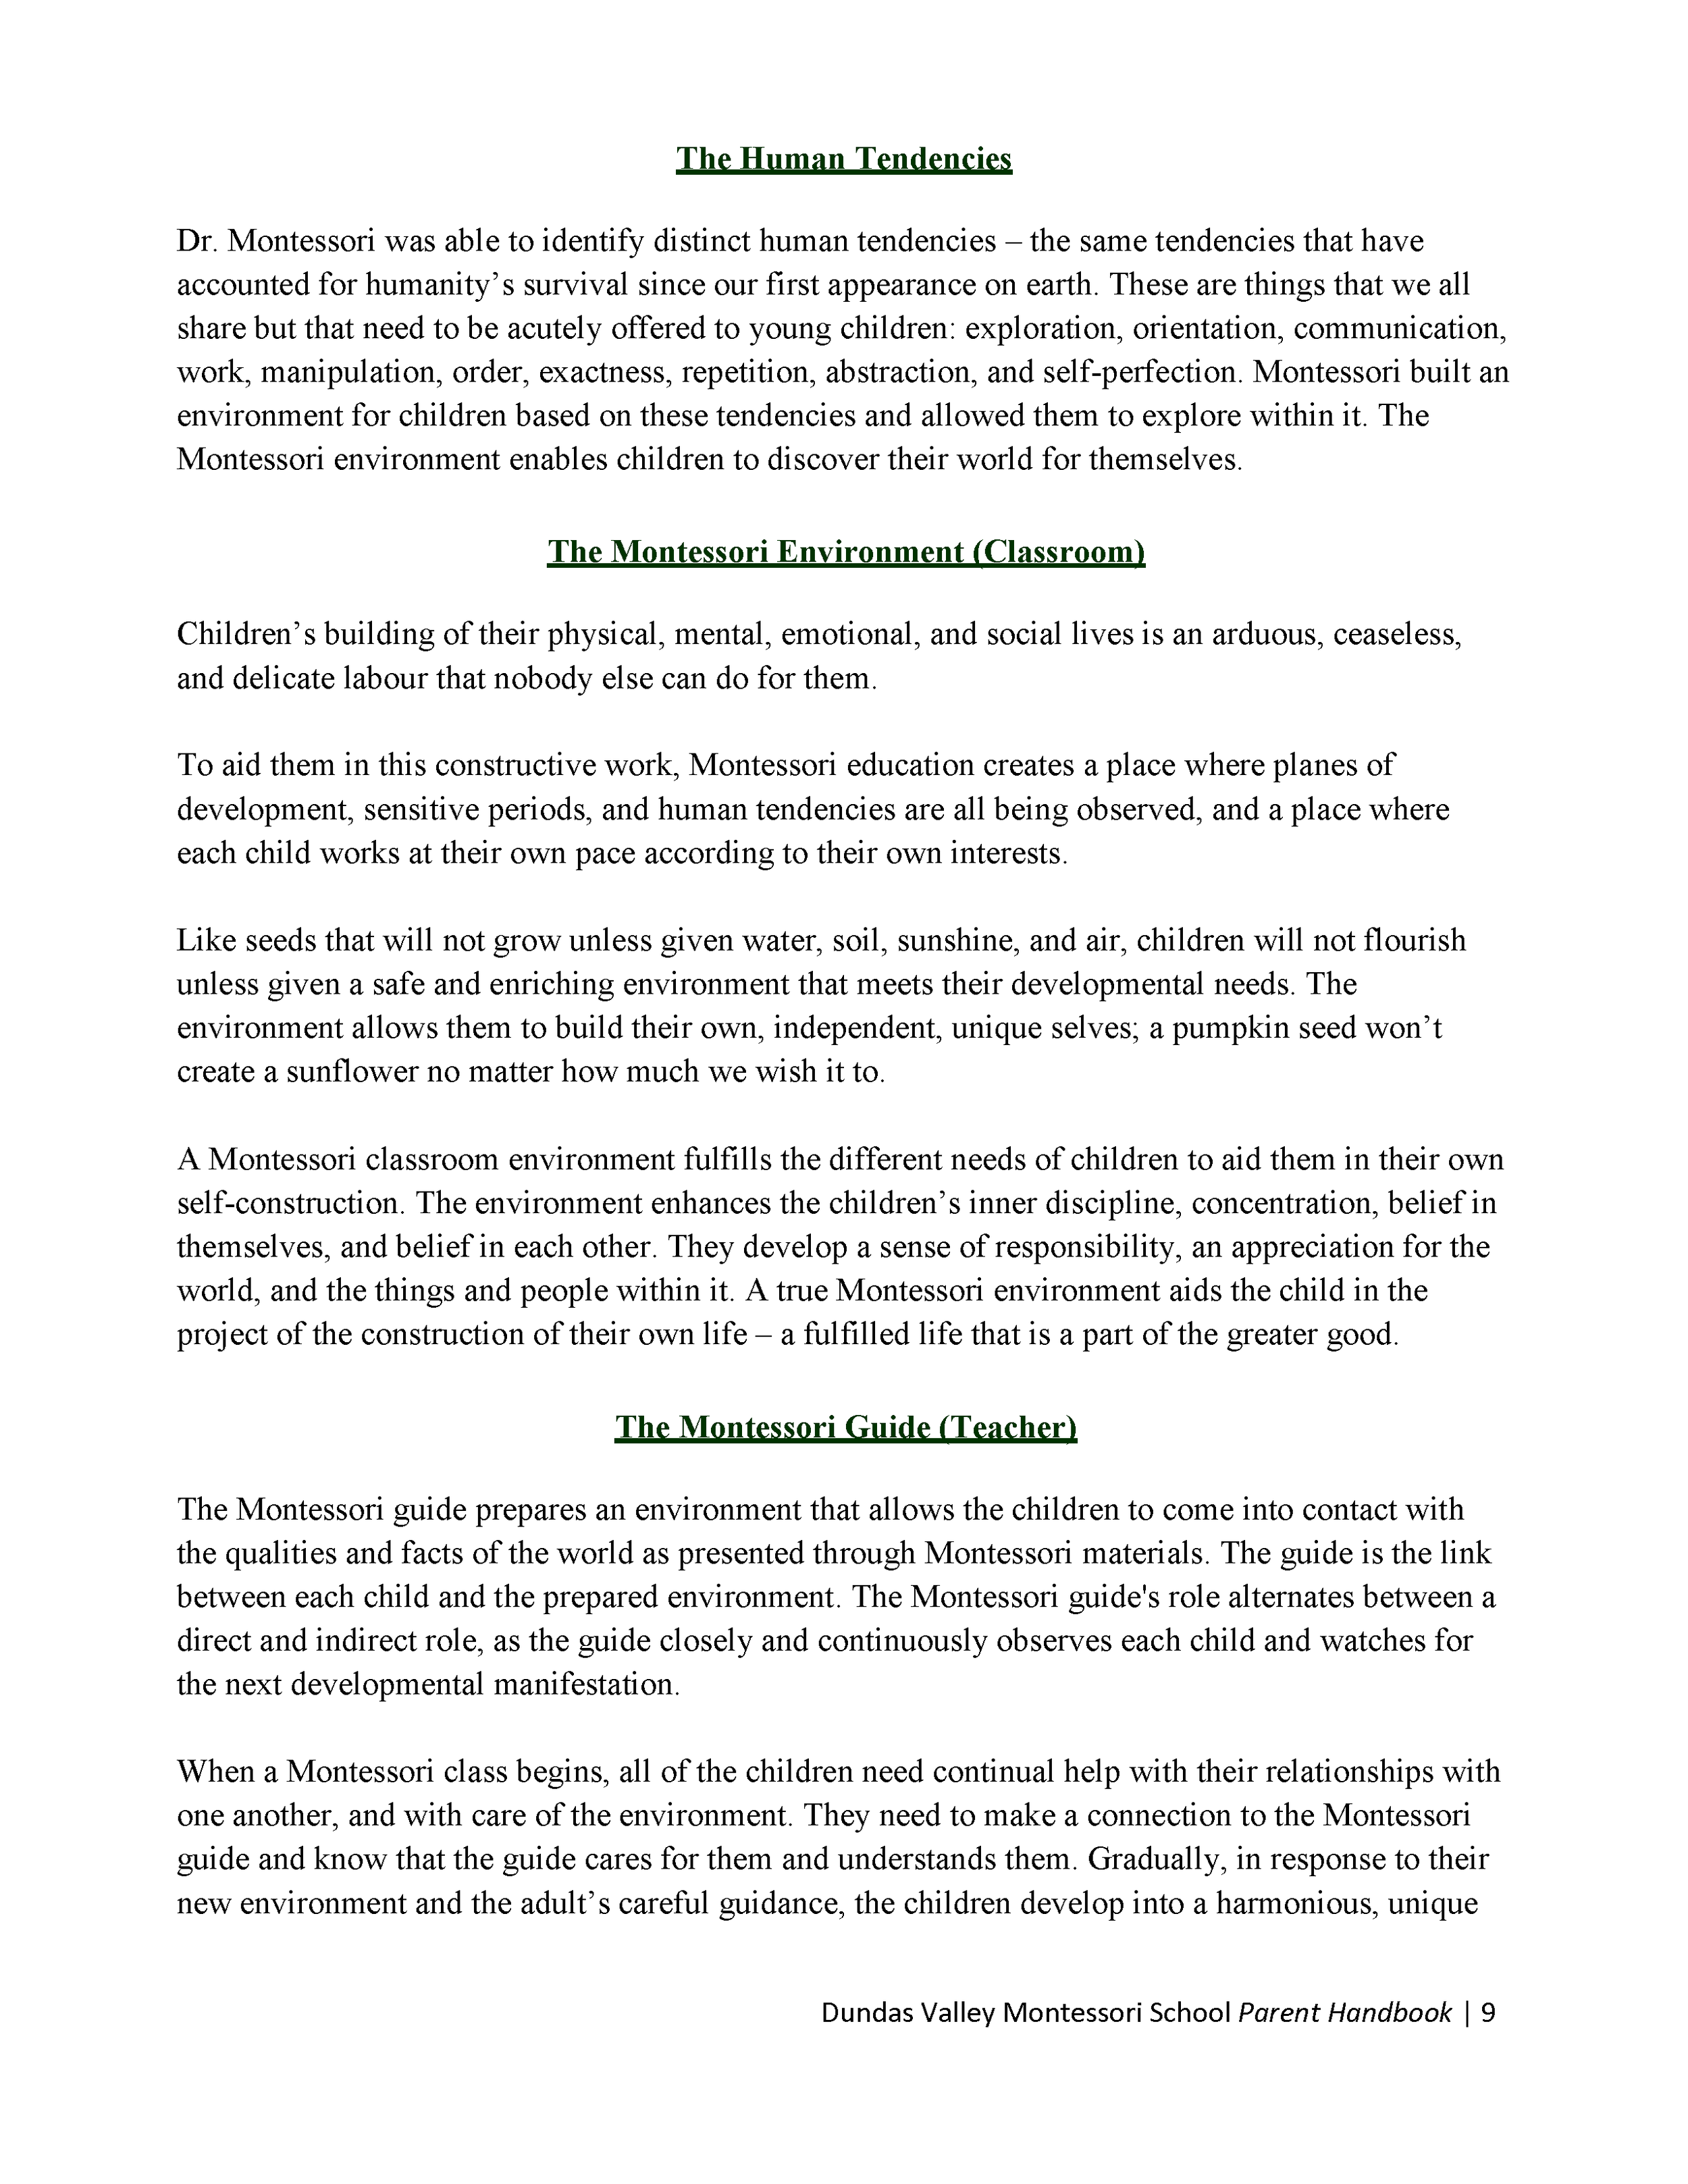 DVMS-Parent-Handbook-19-20_Page_011.png